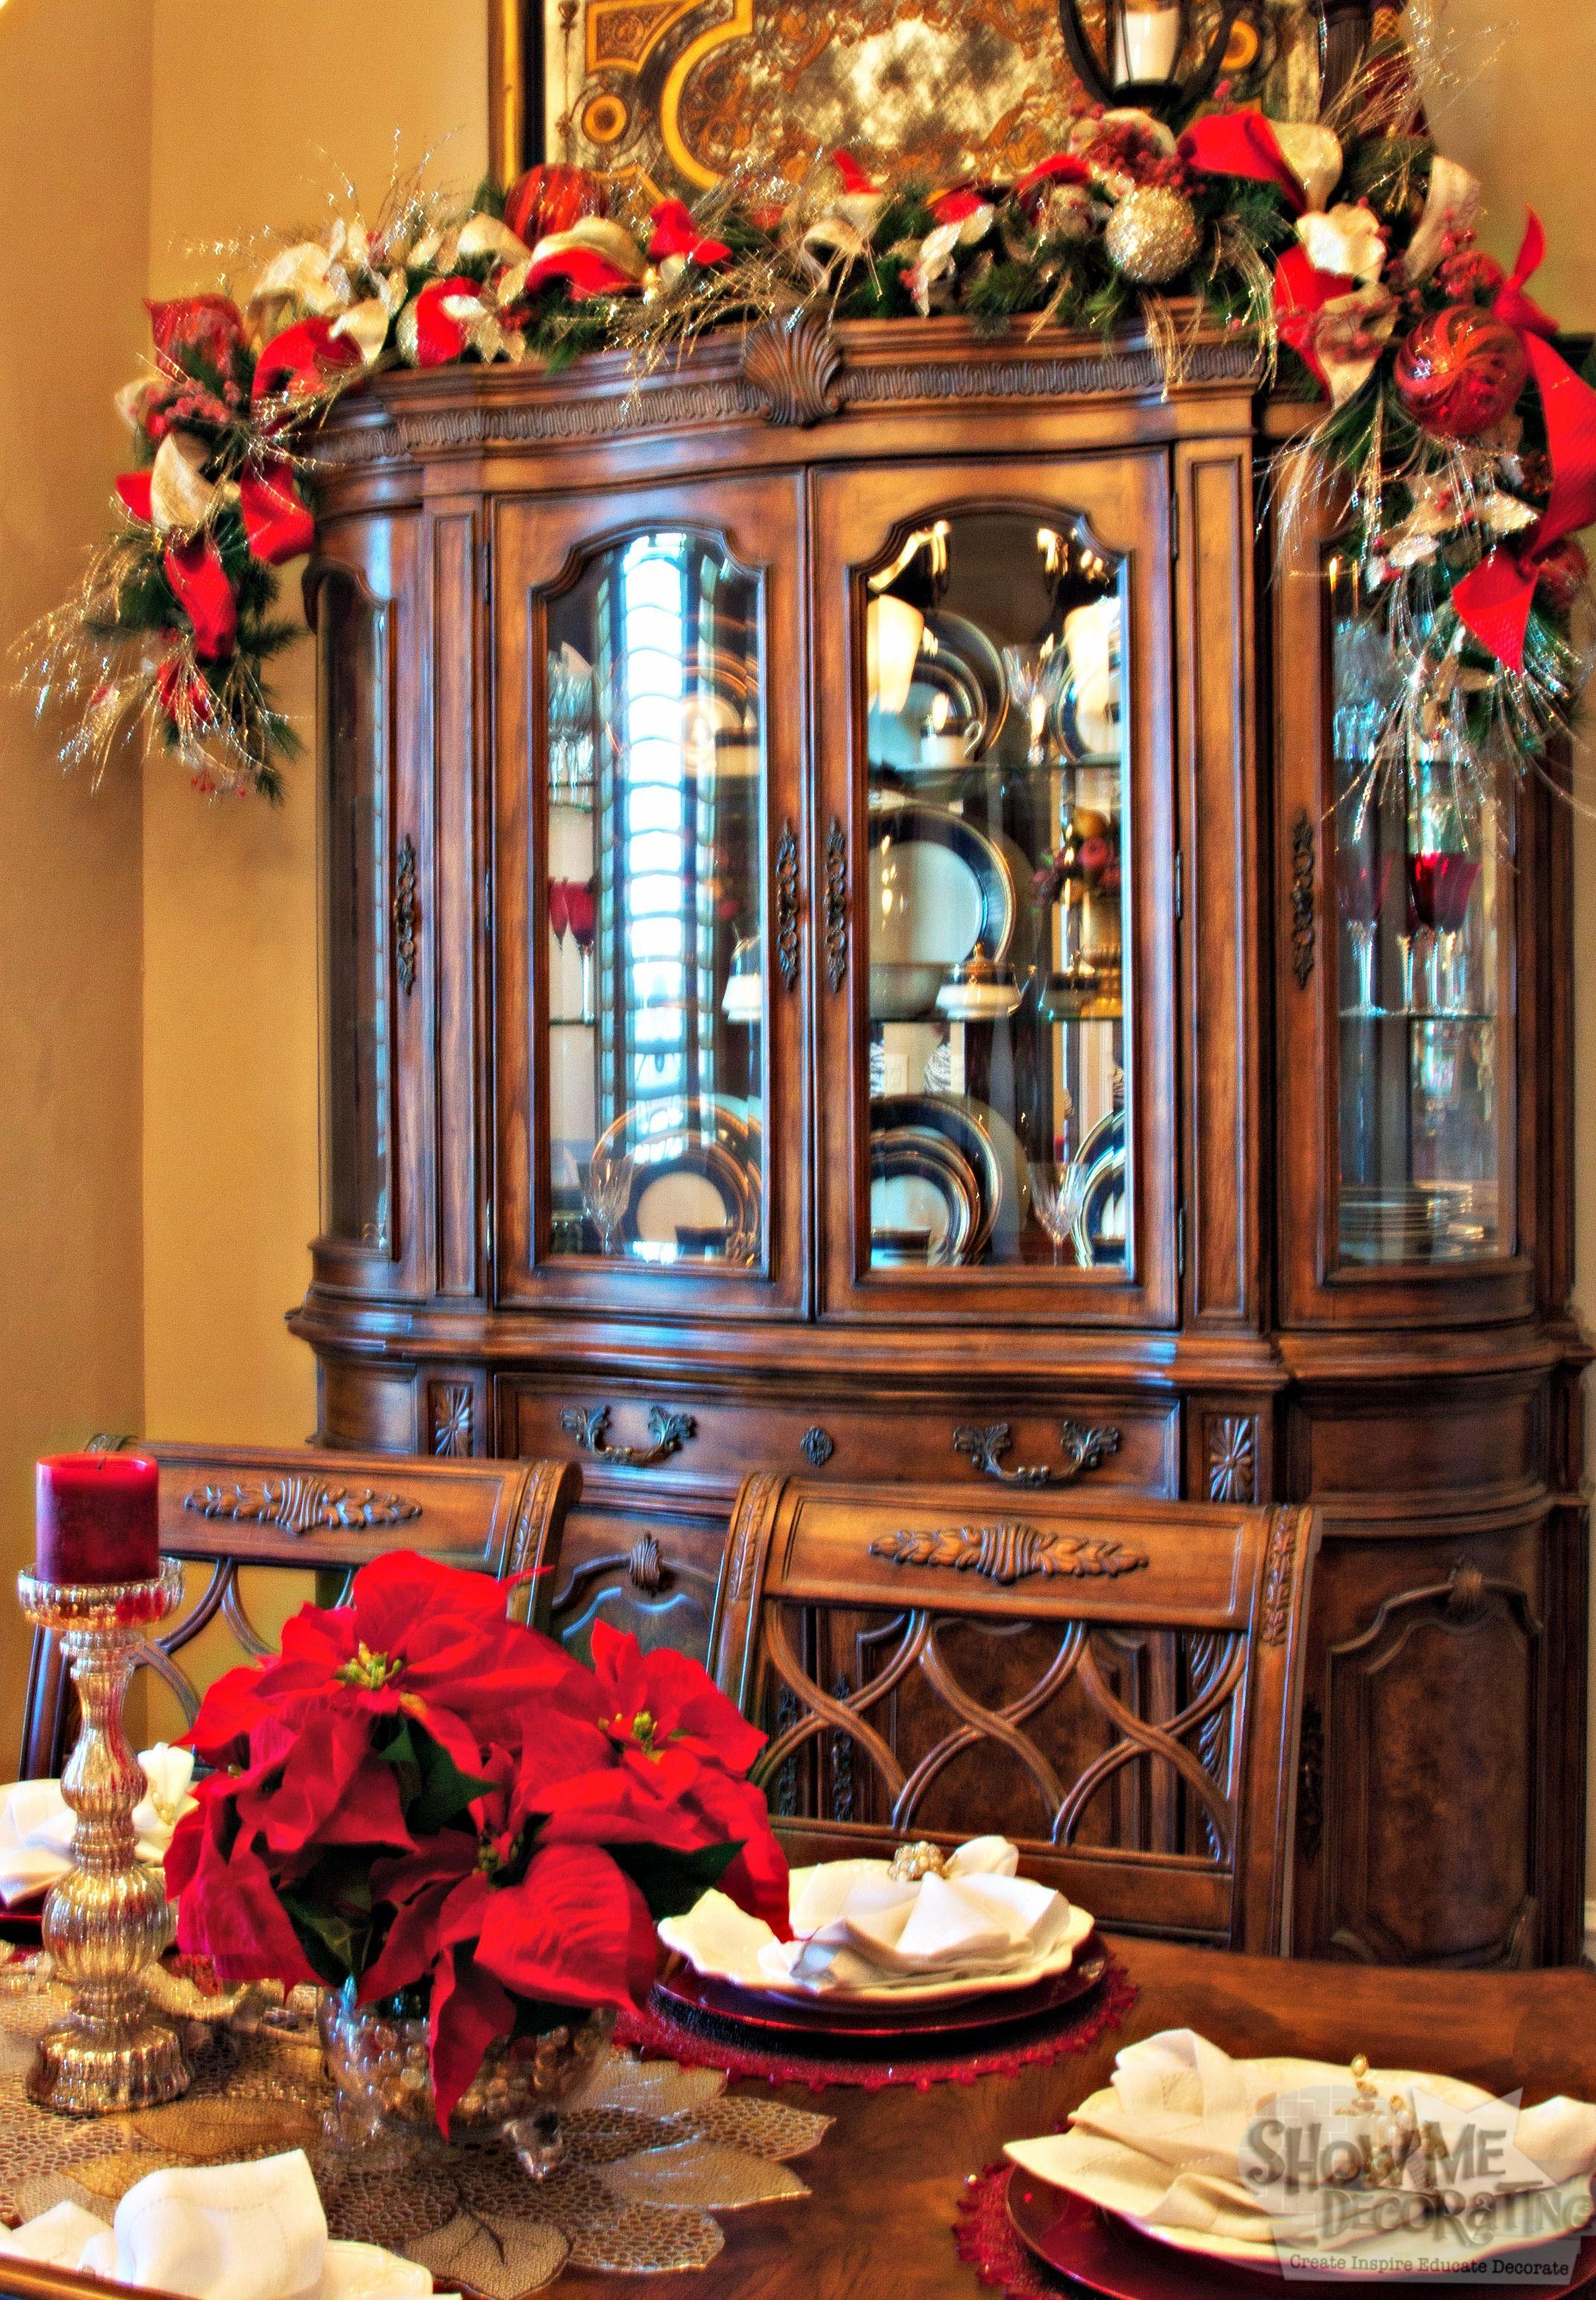 Tremendous Interior Design Ideas To Inspire And Excite Home Decor Complete Home Design Collection Barbaintelli Responsecom